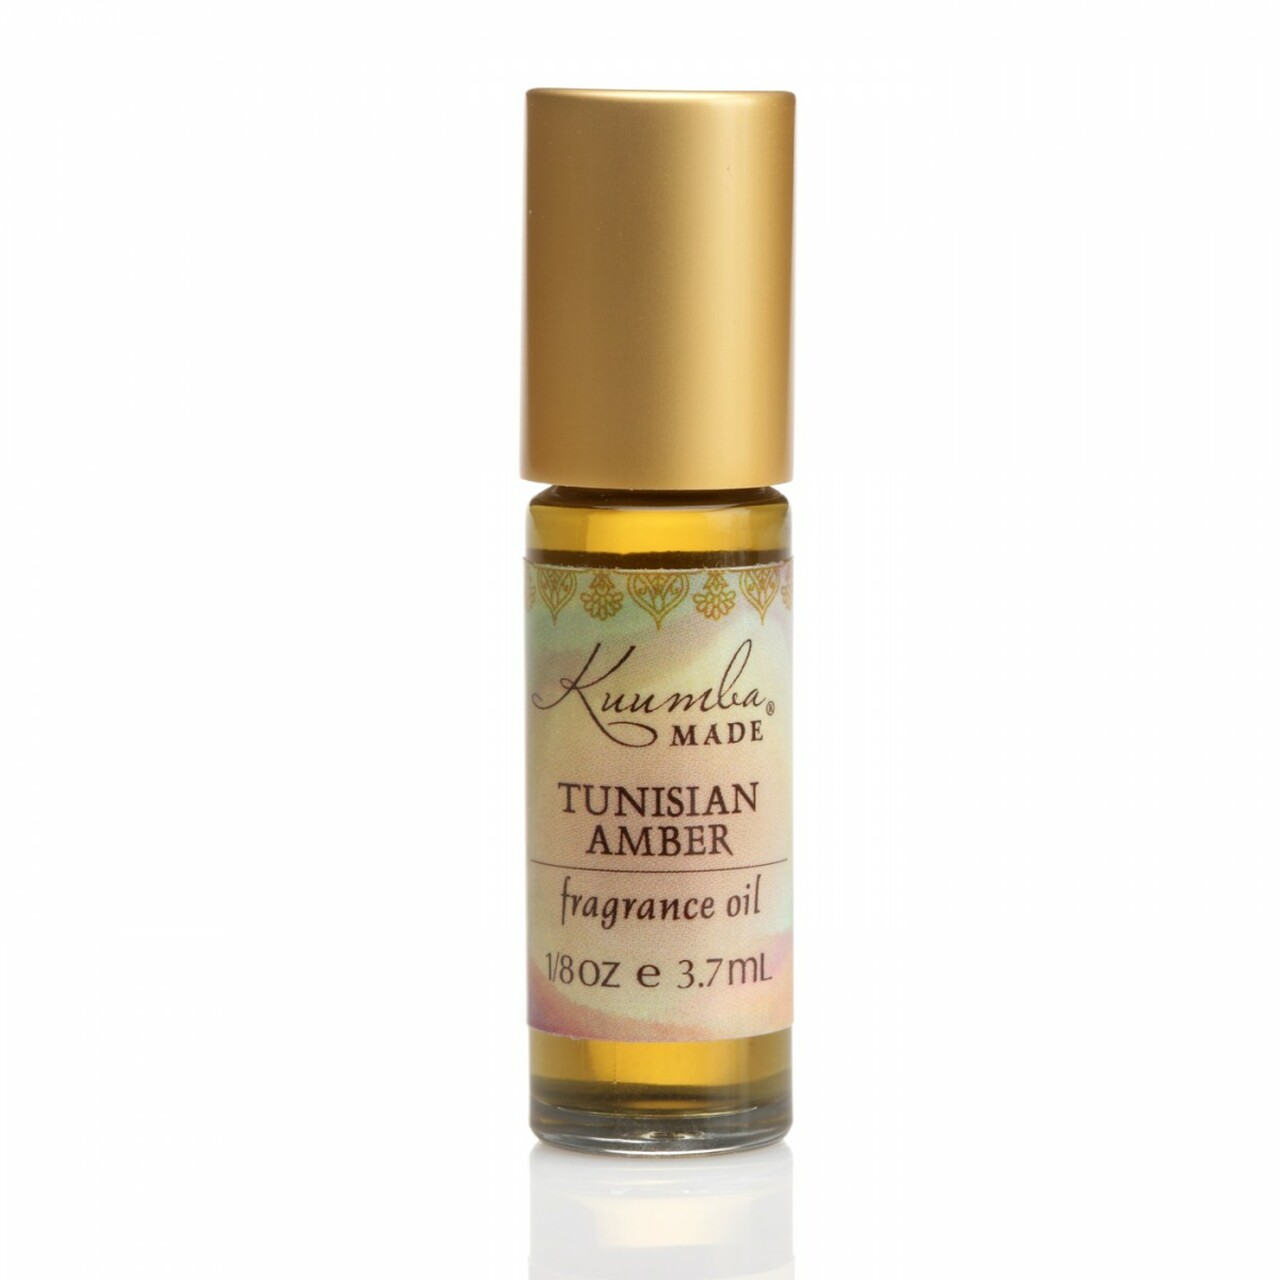 Kuumba Made Tunisian Amber Fragrance Oil